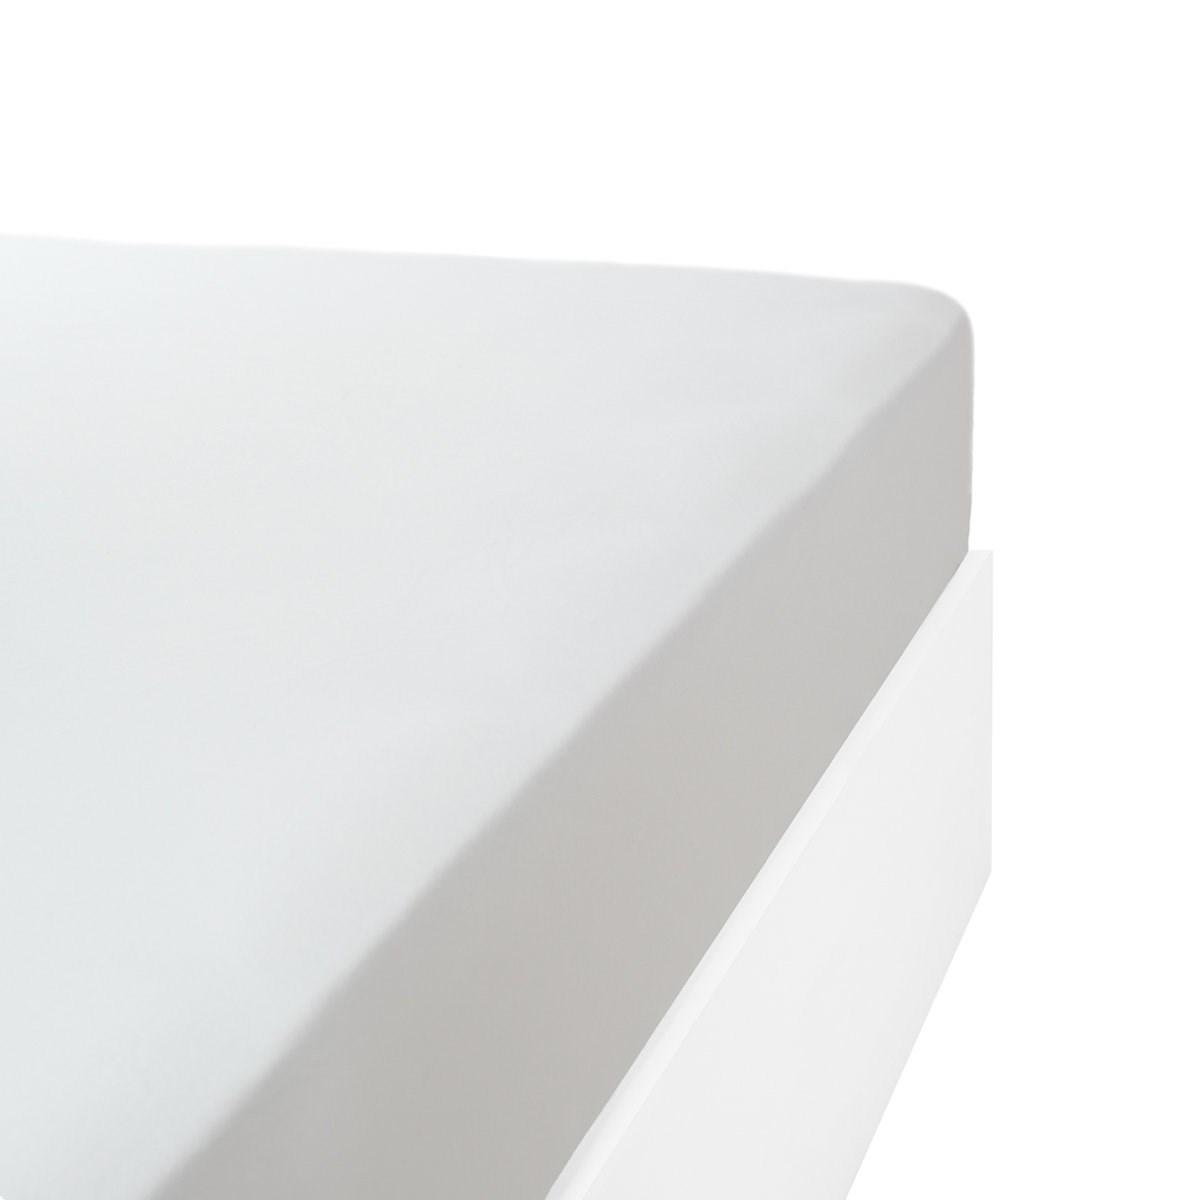 Drap housse jersey extensible en coton blanc 180x200 cm